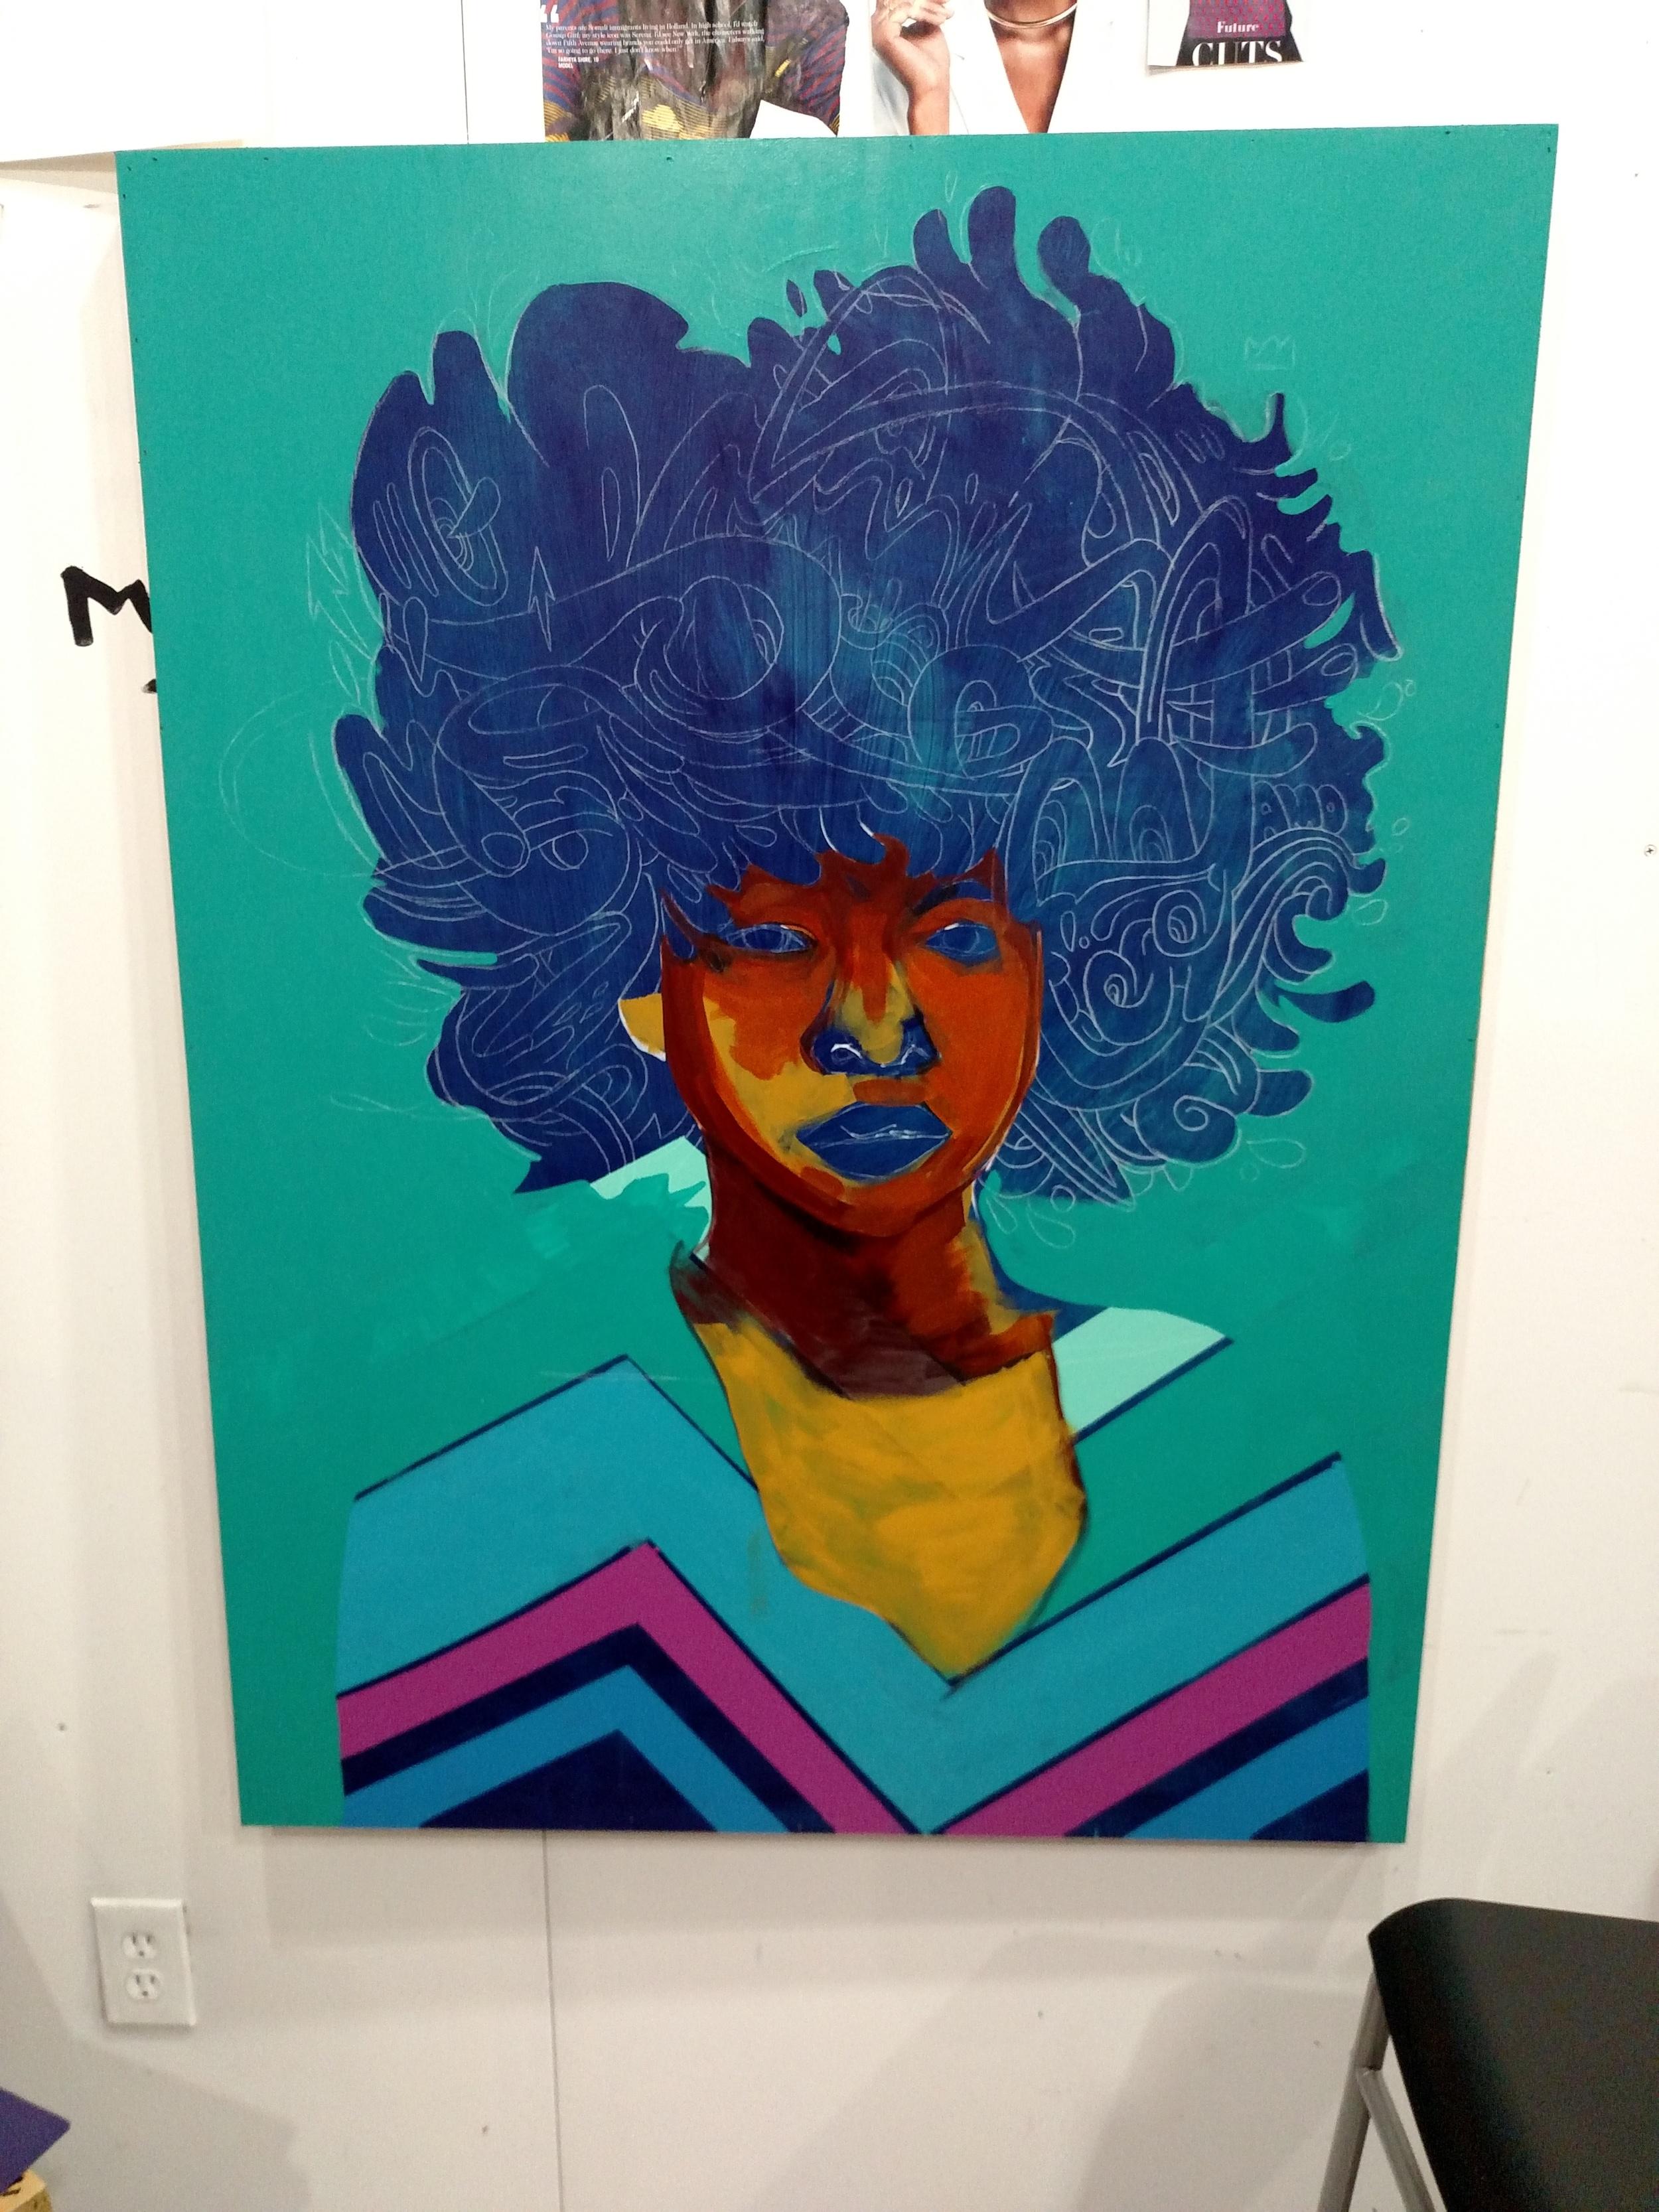 Fro Painting progress pic 2. Jtdanielsart